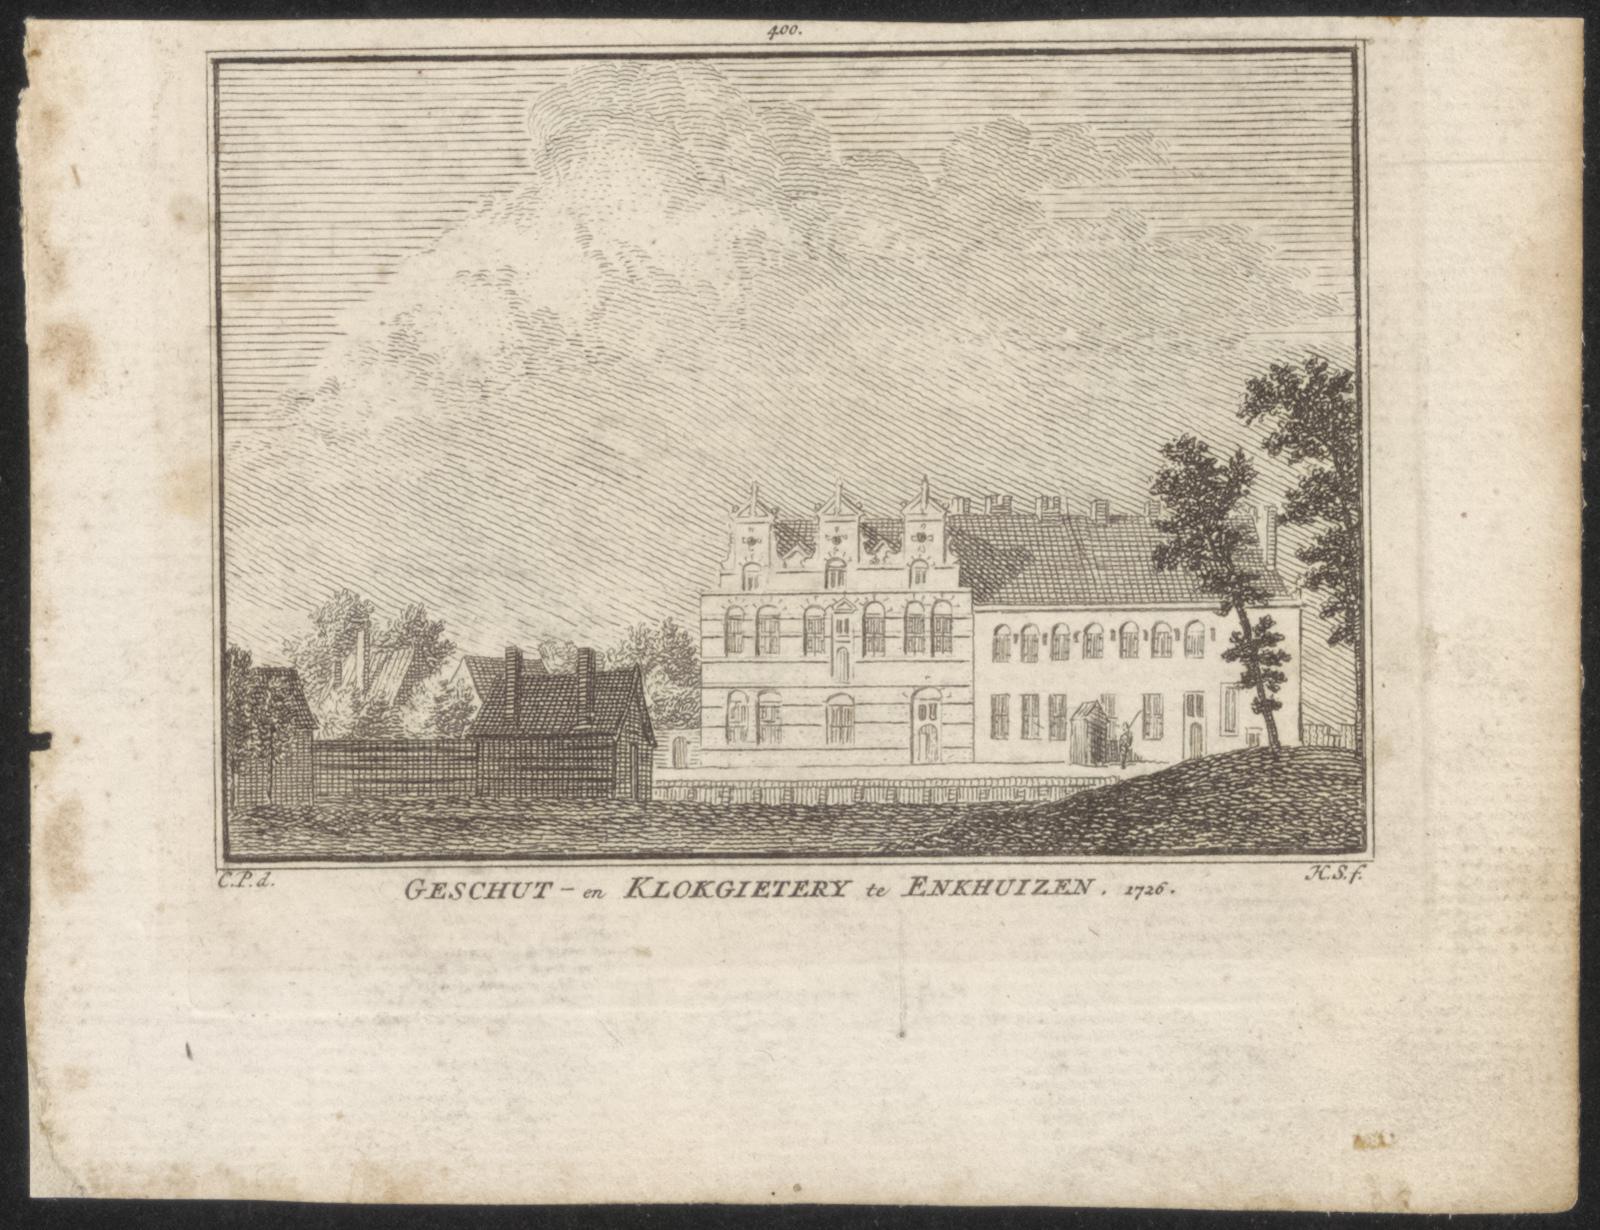 Geschut- en klokgietery te Enkhuizen 1726.